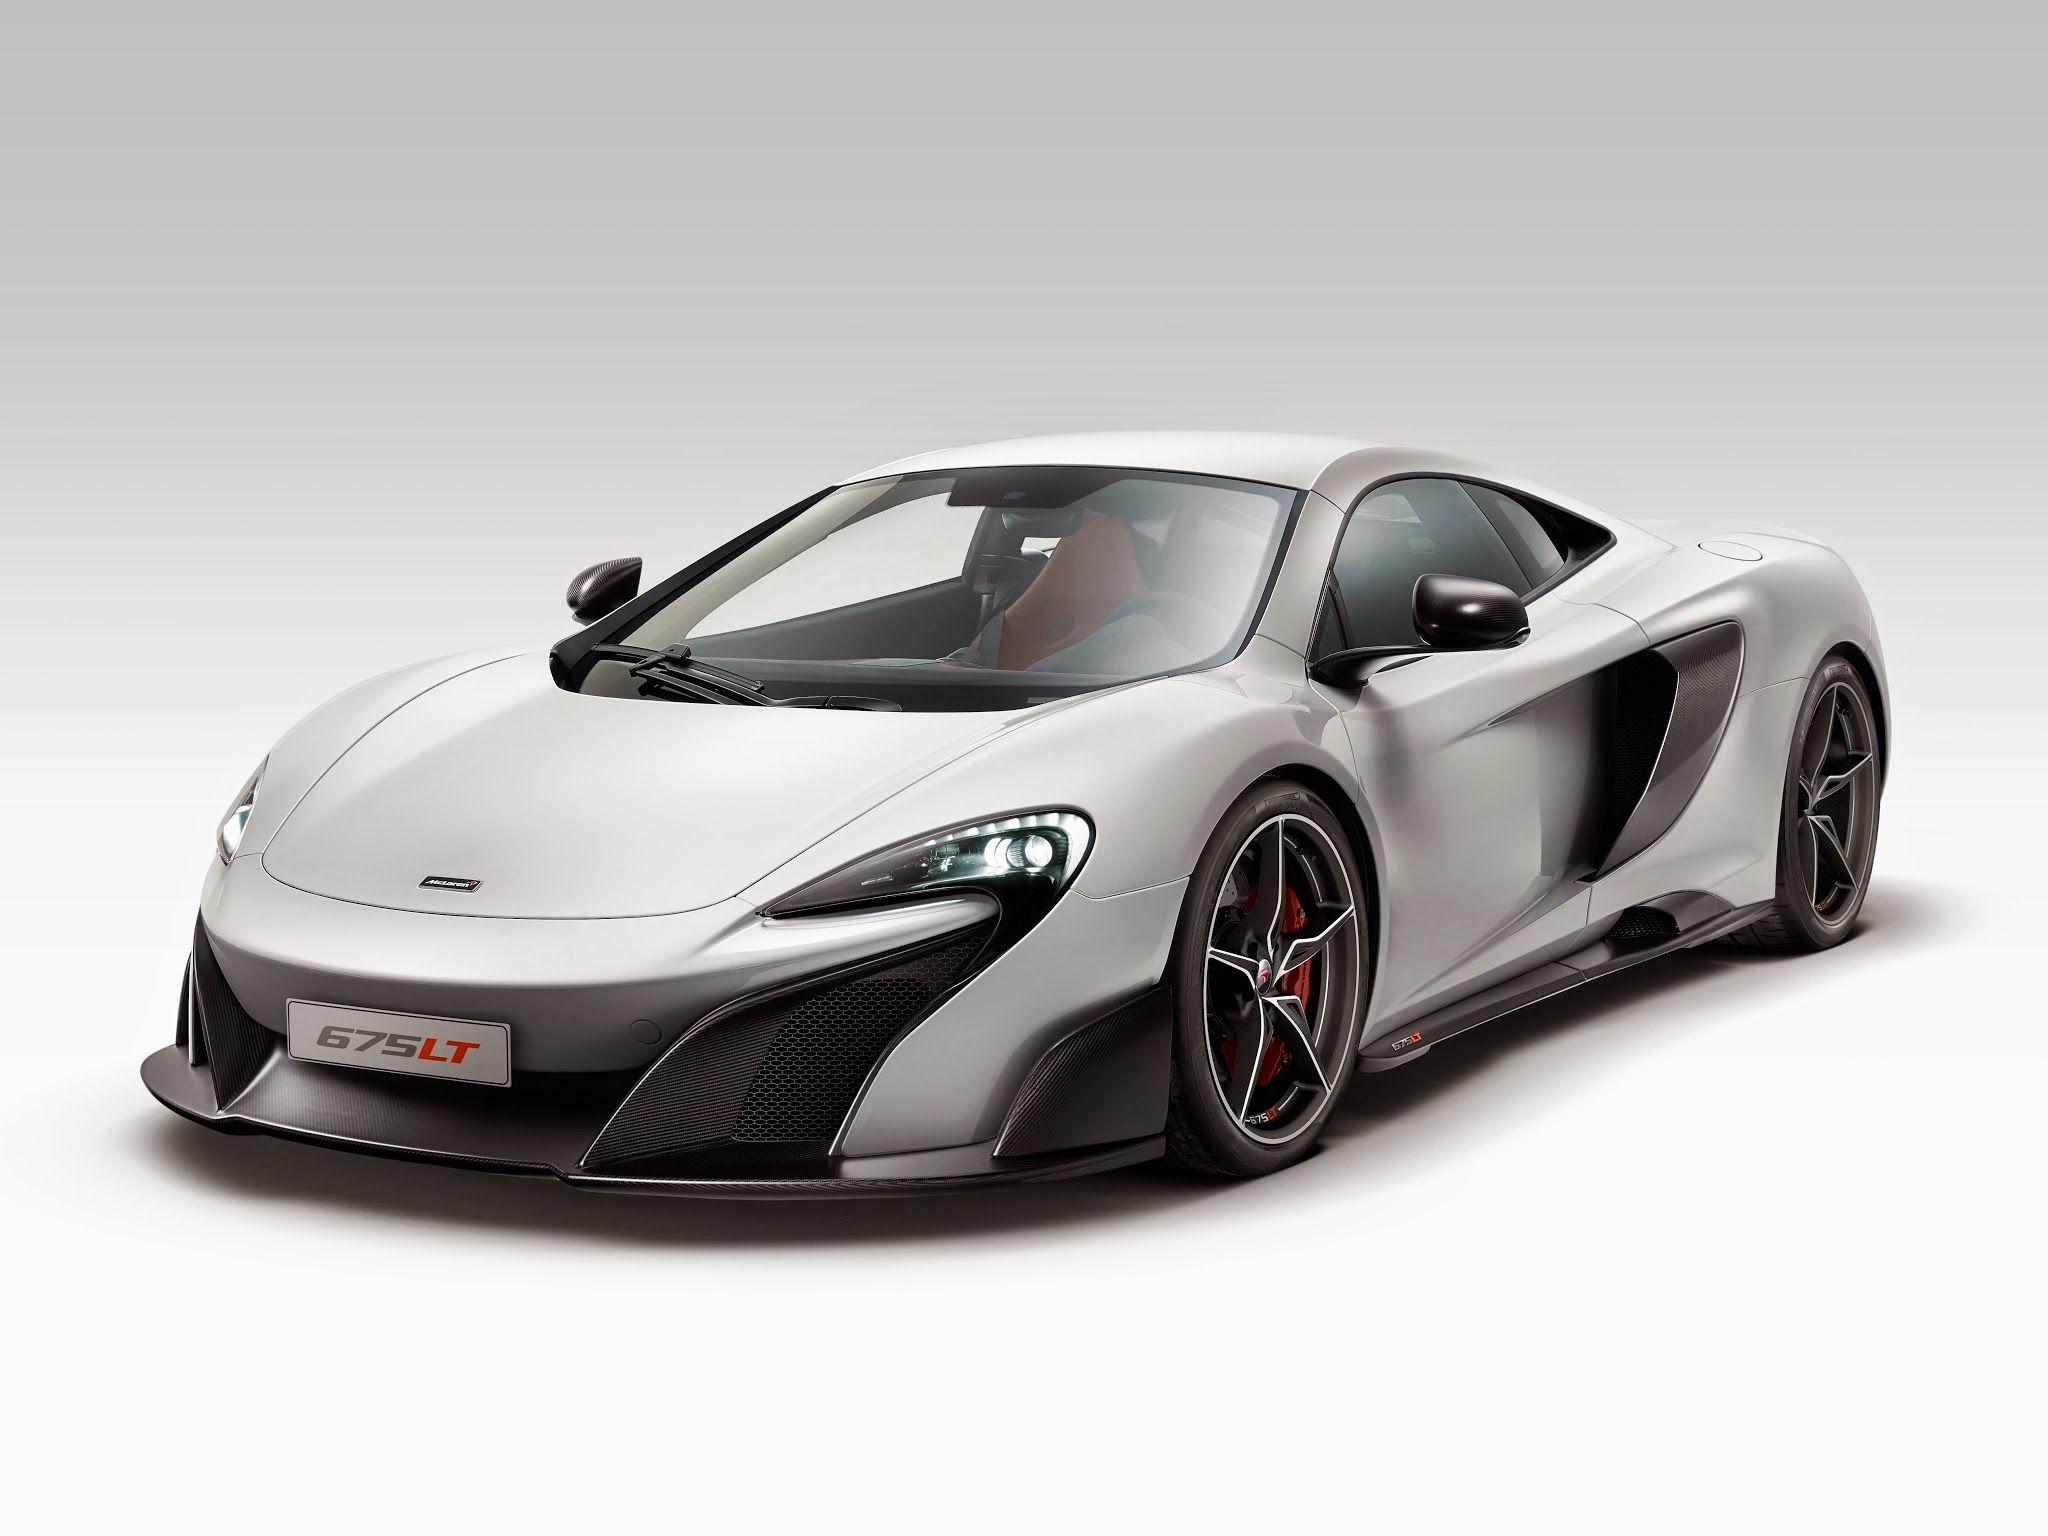 http://static1.therichestimages.com/cdn/1000/750/90/cw/wp-content/uploads/2015/04/McLaren-675-LT.jpg